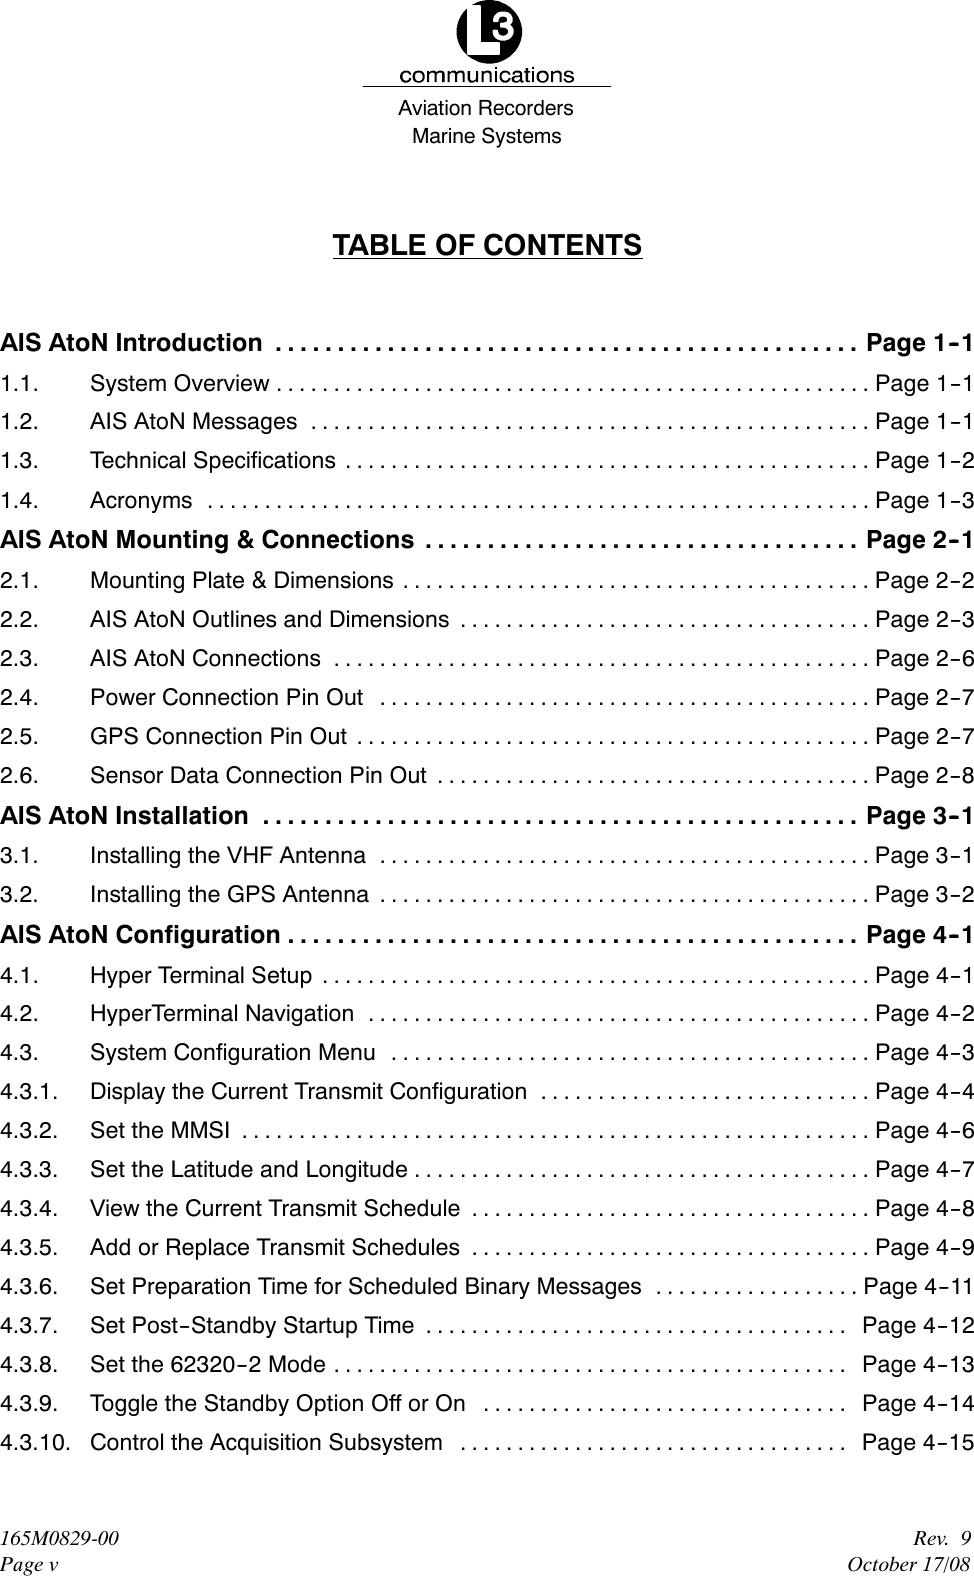 L3 Technologies 0ATN01 Aid to Navigation (AtoN) AIS User